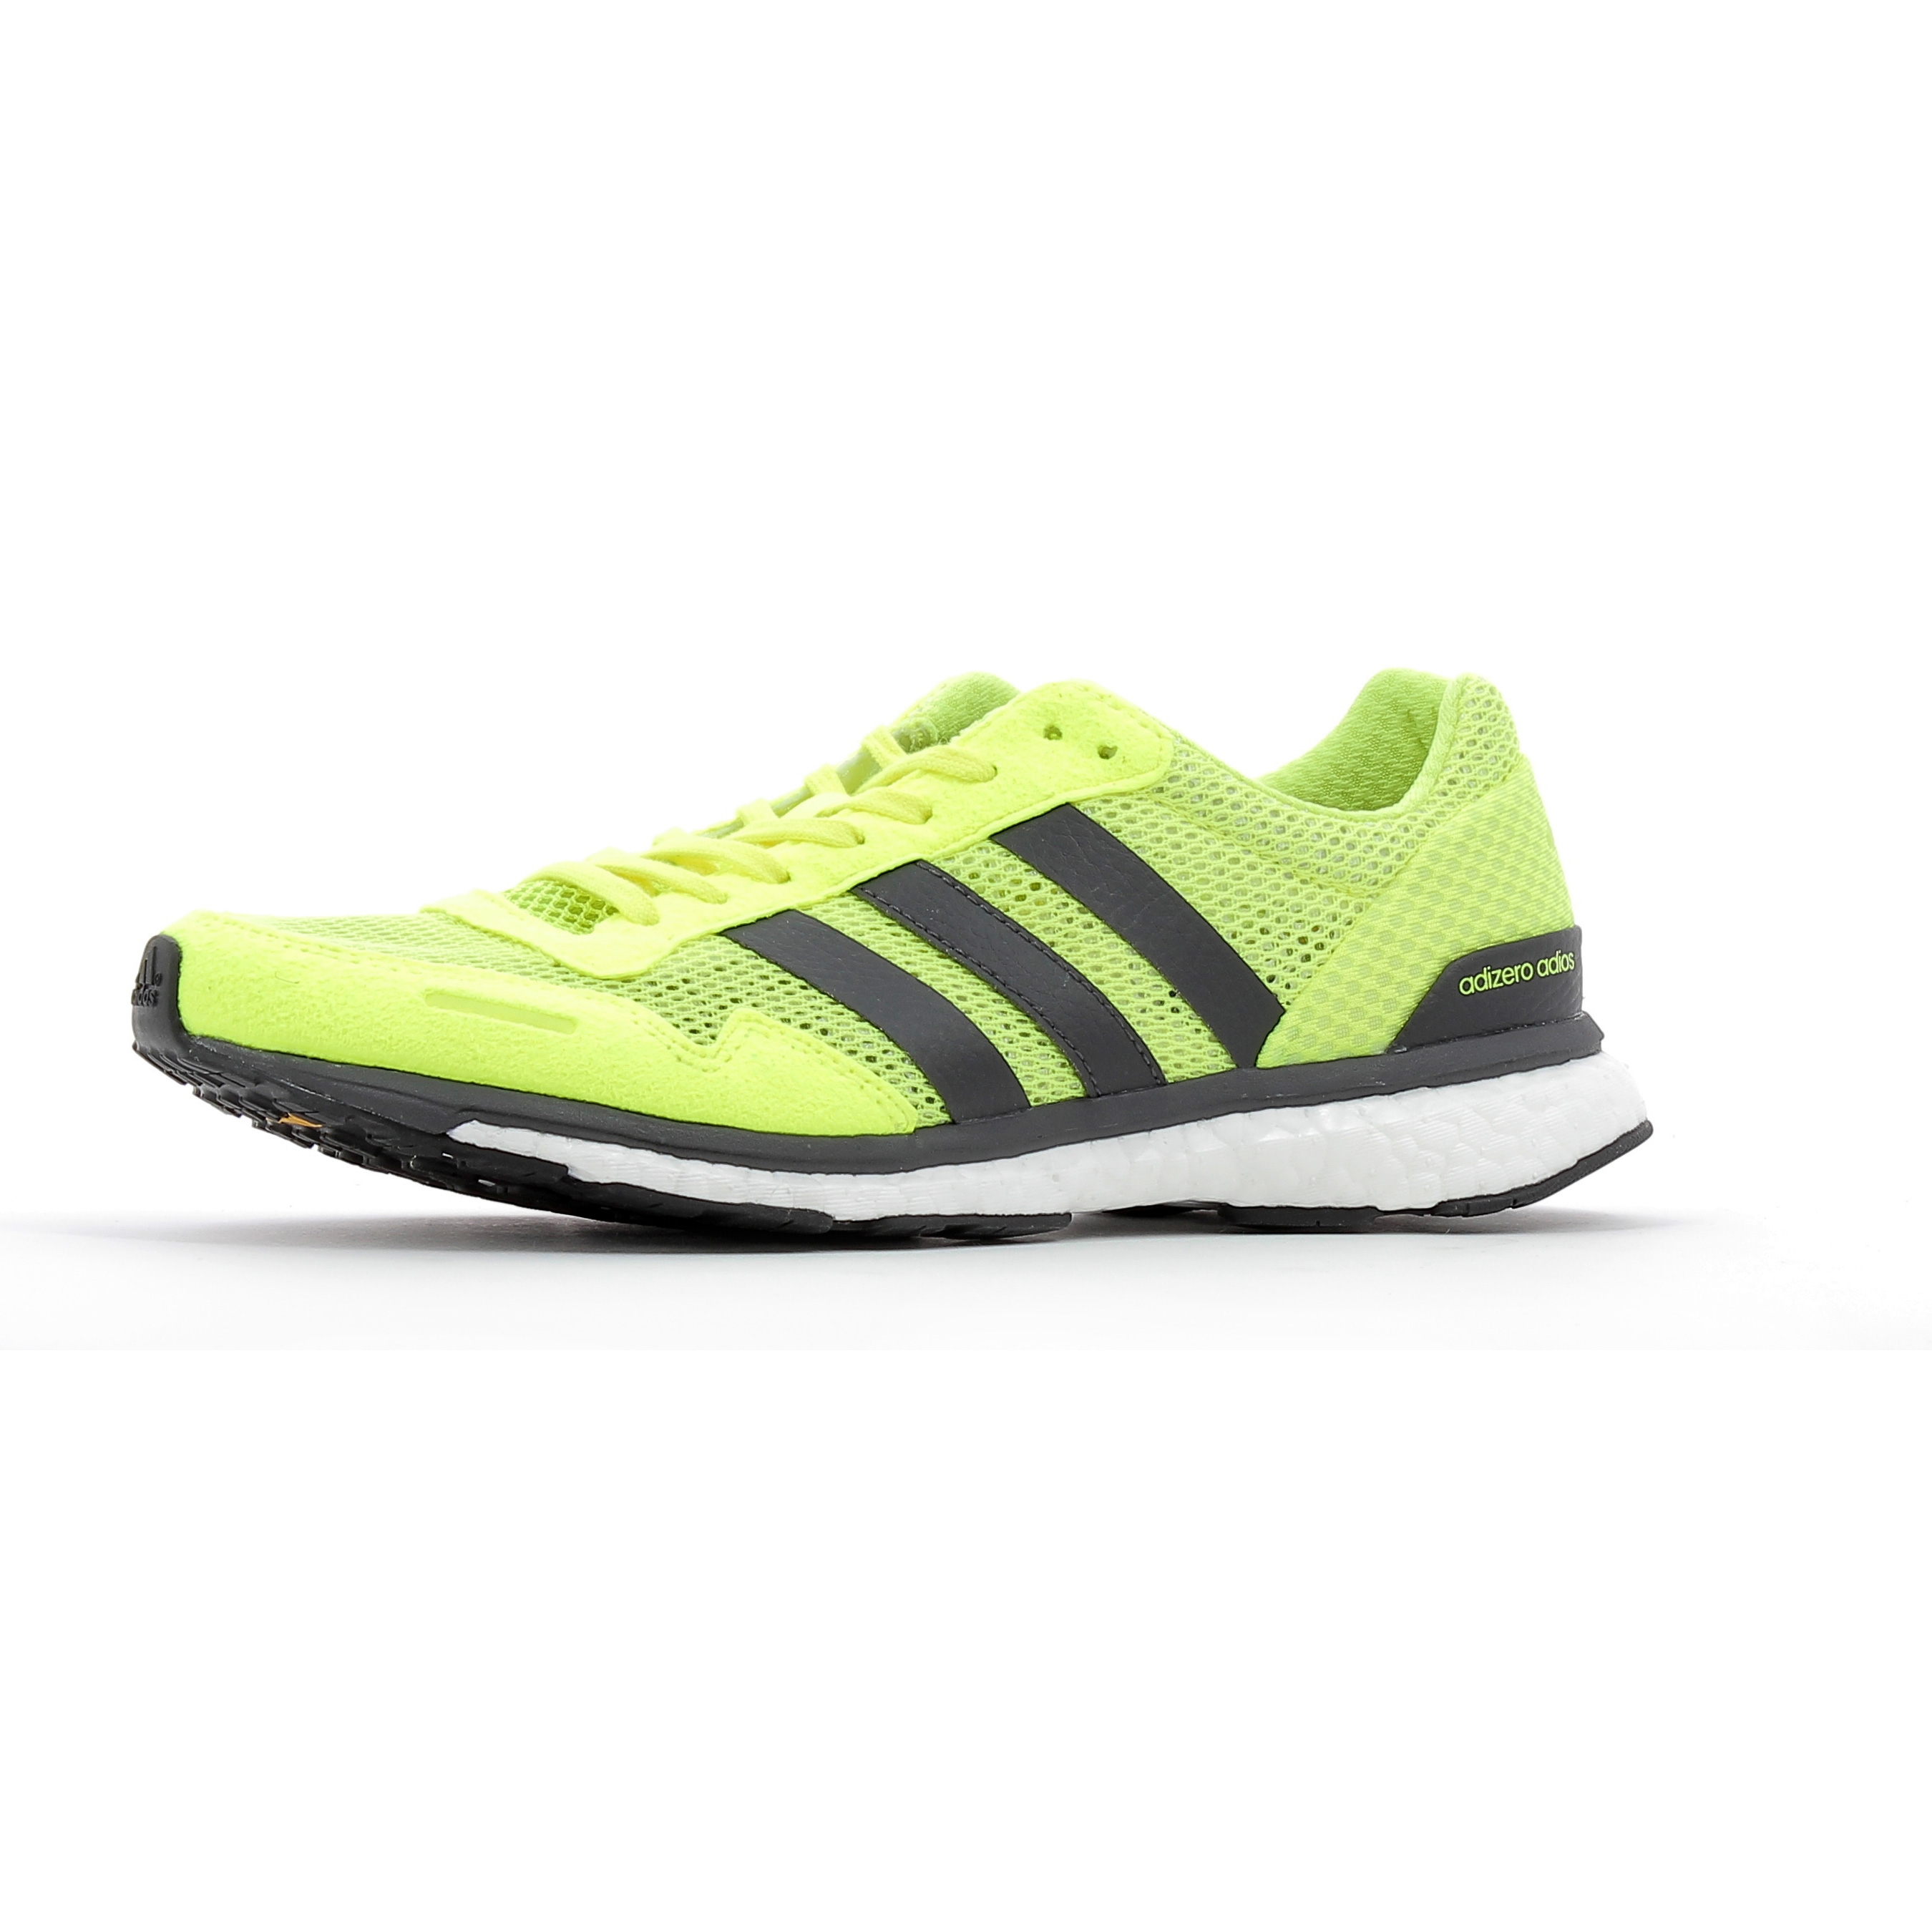 0bef2e369218 Chaussures de running Adidas Performance Adizero Adios M